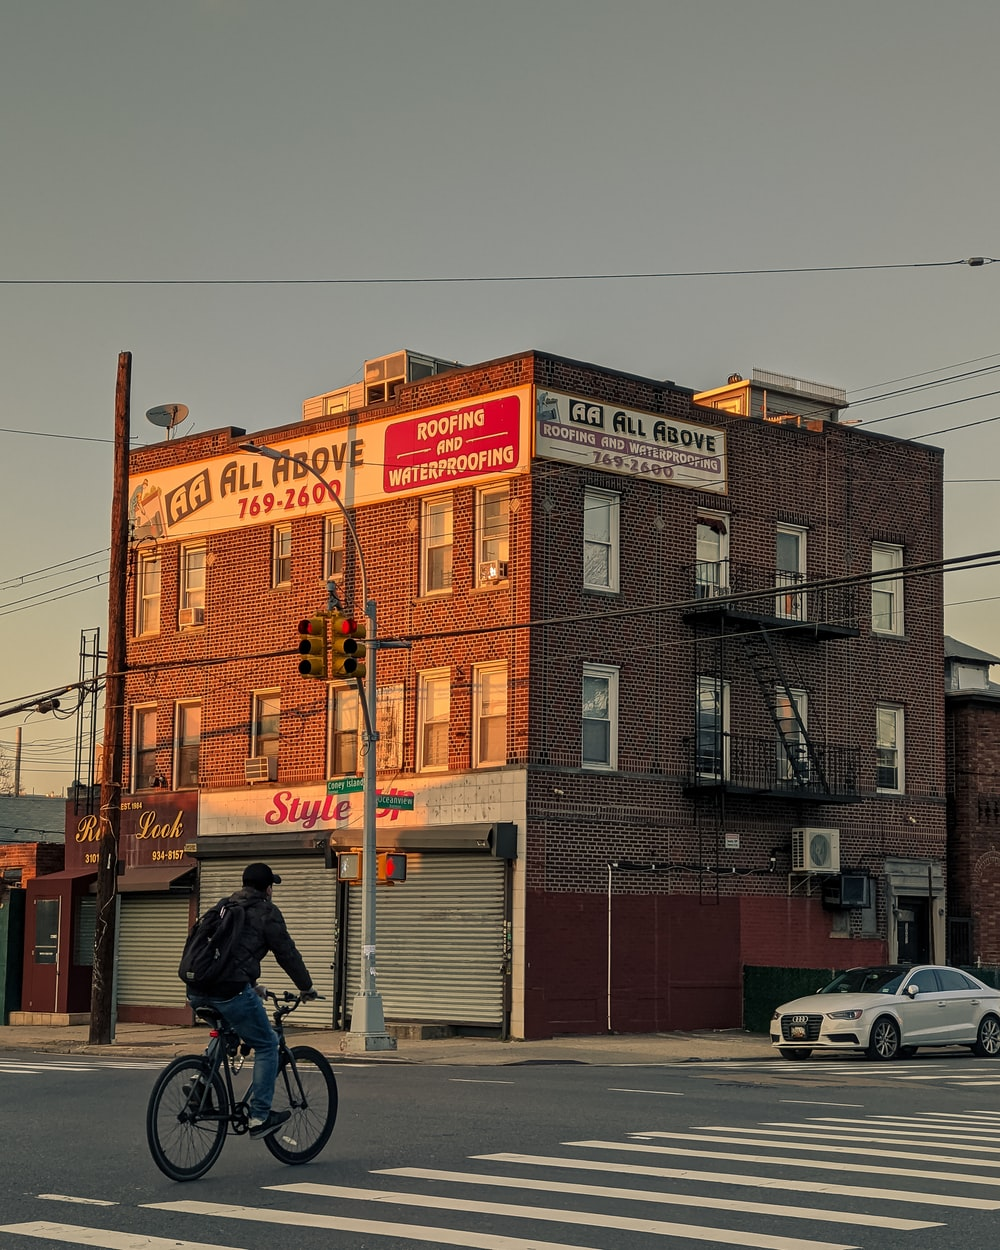 man in black jacket riding bicycle near brown concrete building during daytime